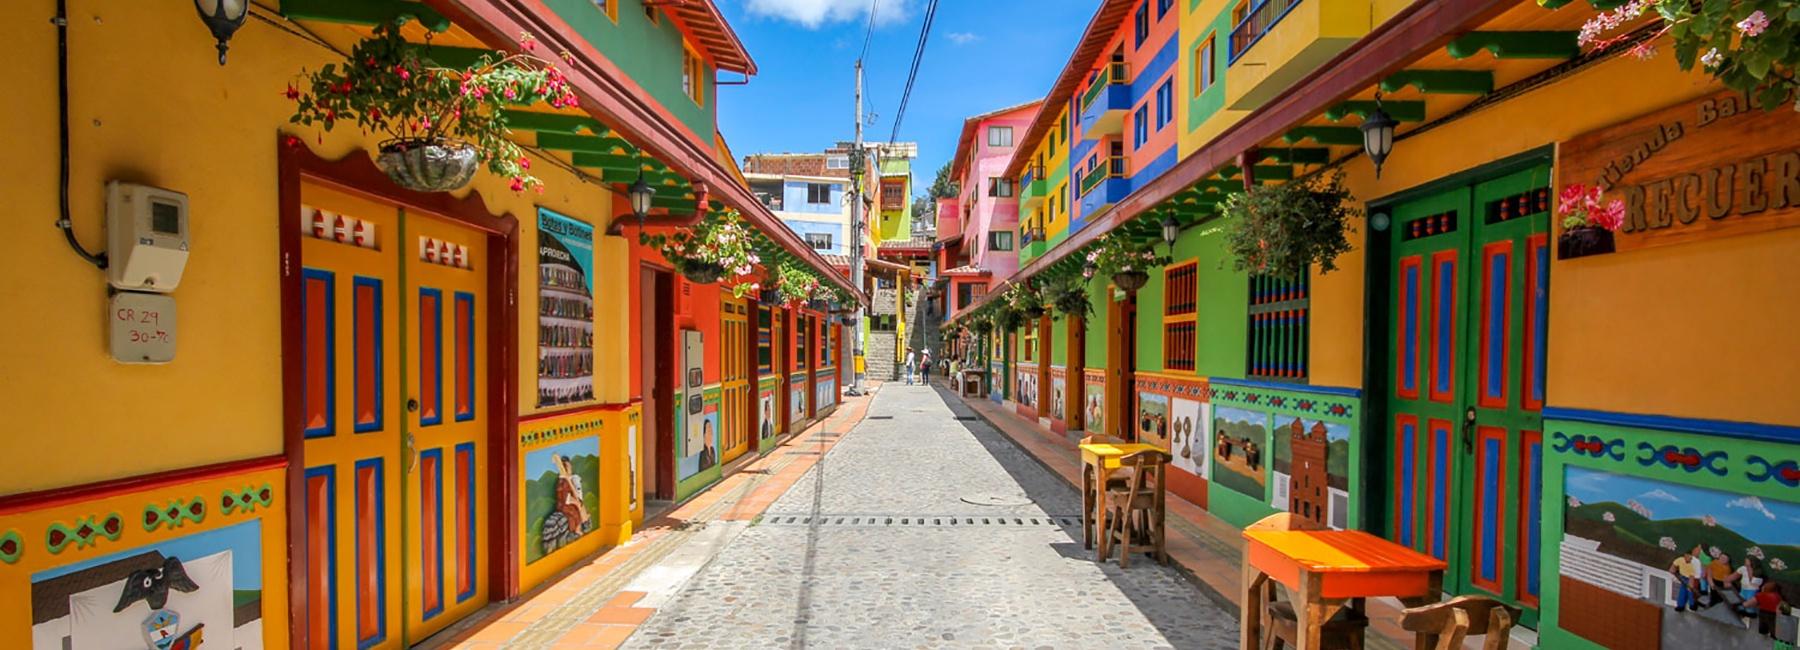 jessica-devnani-guatape-colombia-colorful-town-designboom-1800.jpg